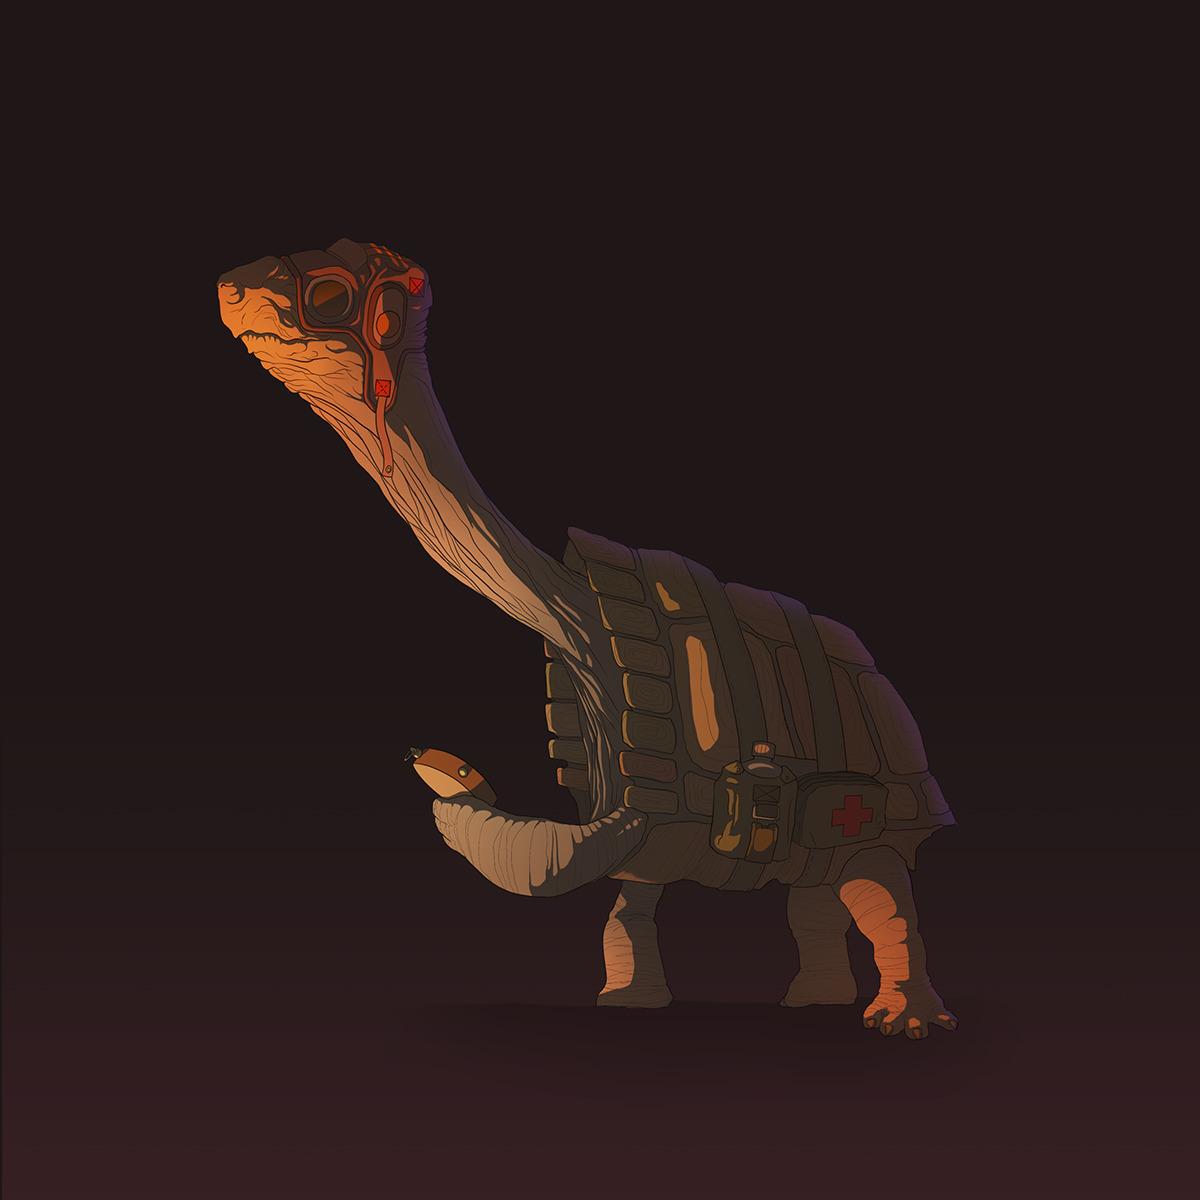 Pilot Turtle - illustration, characterdesign - geberluis | ello